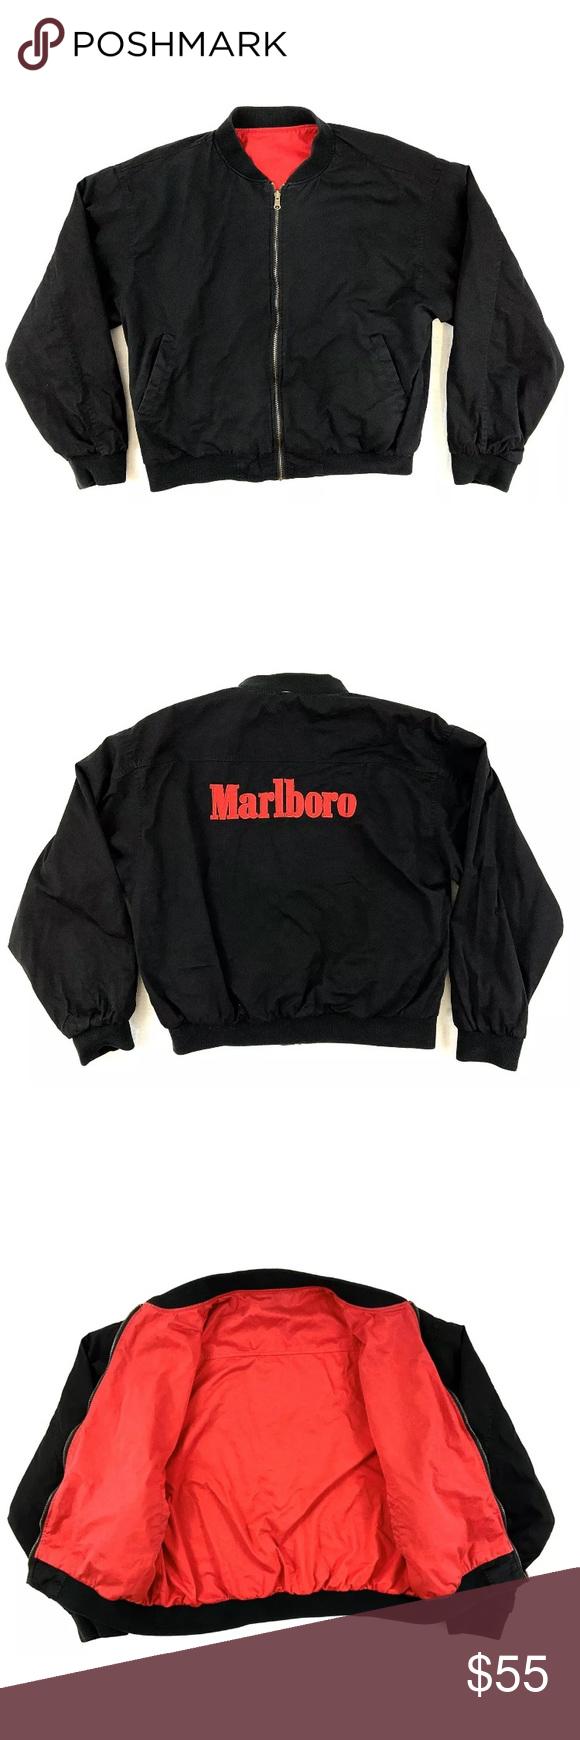 Vintage Marlboro Reversible Bomber Jacket Mens Vintage Marlboro Reversible Bomber Jacket Mens Condition Pre Owned Good N Bomber Jacket Mens Jackets Jackets